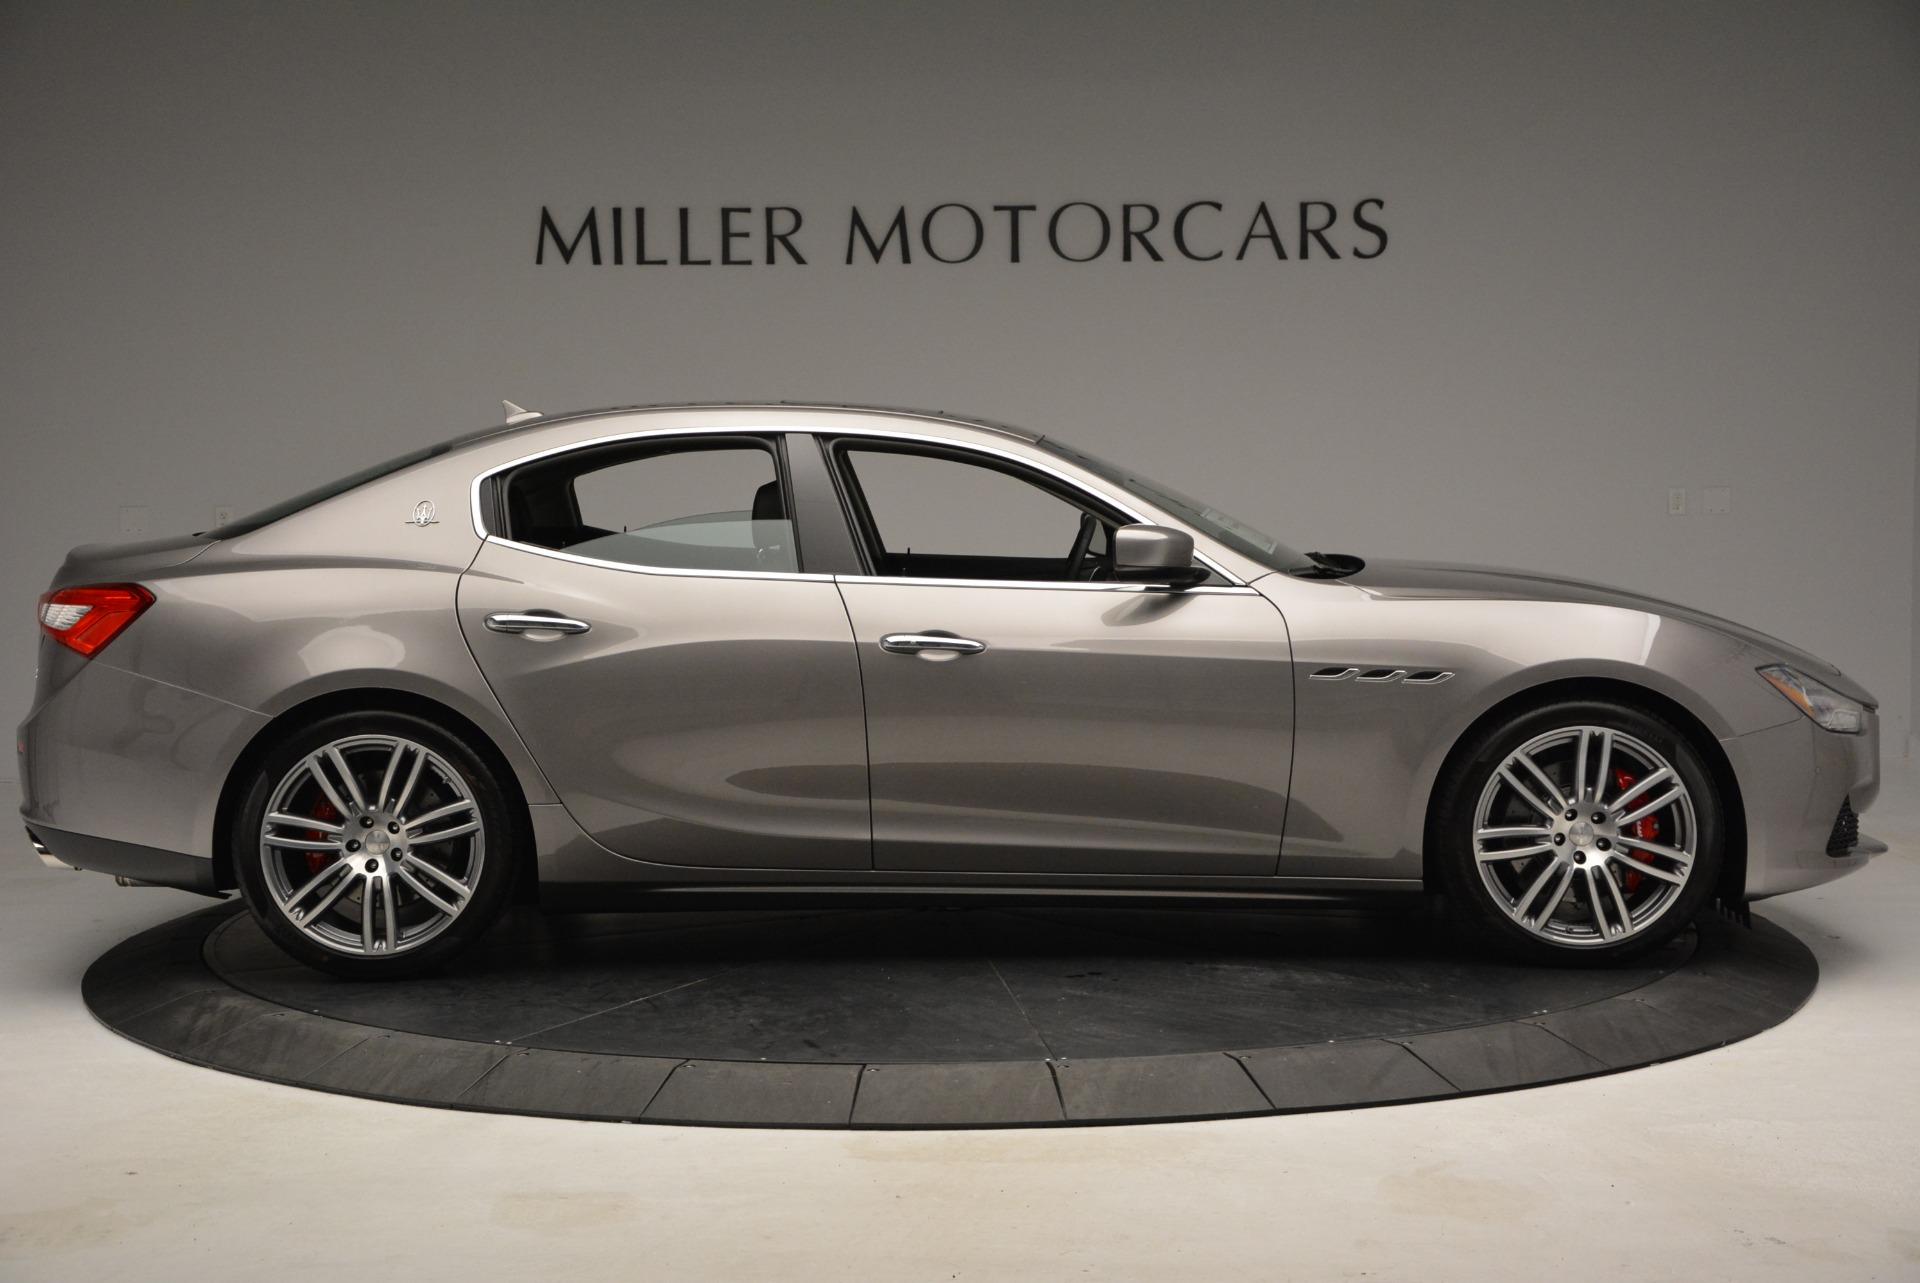 Used 2014 Maserati Ghibli S Q4 For Sale In Greenwich, CT. Alfa Romeo of Greenwich, 7426 2562_p9